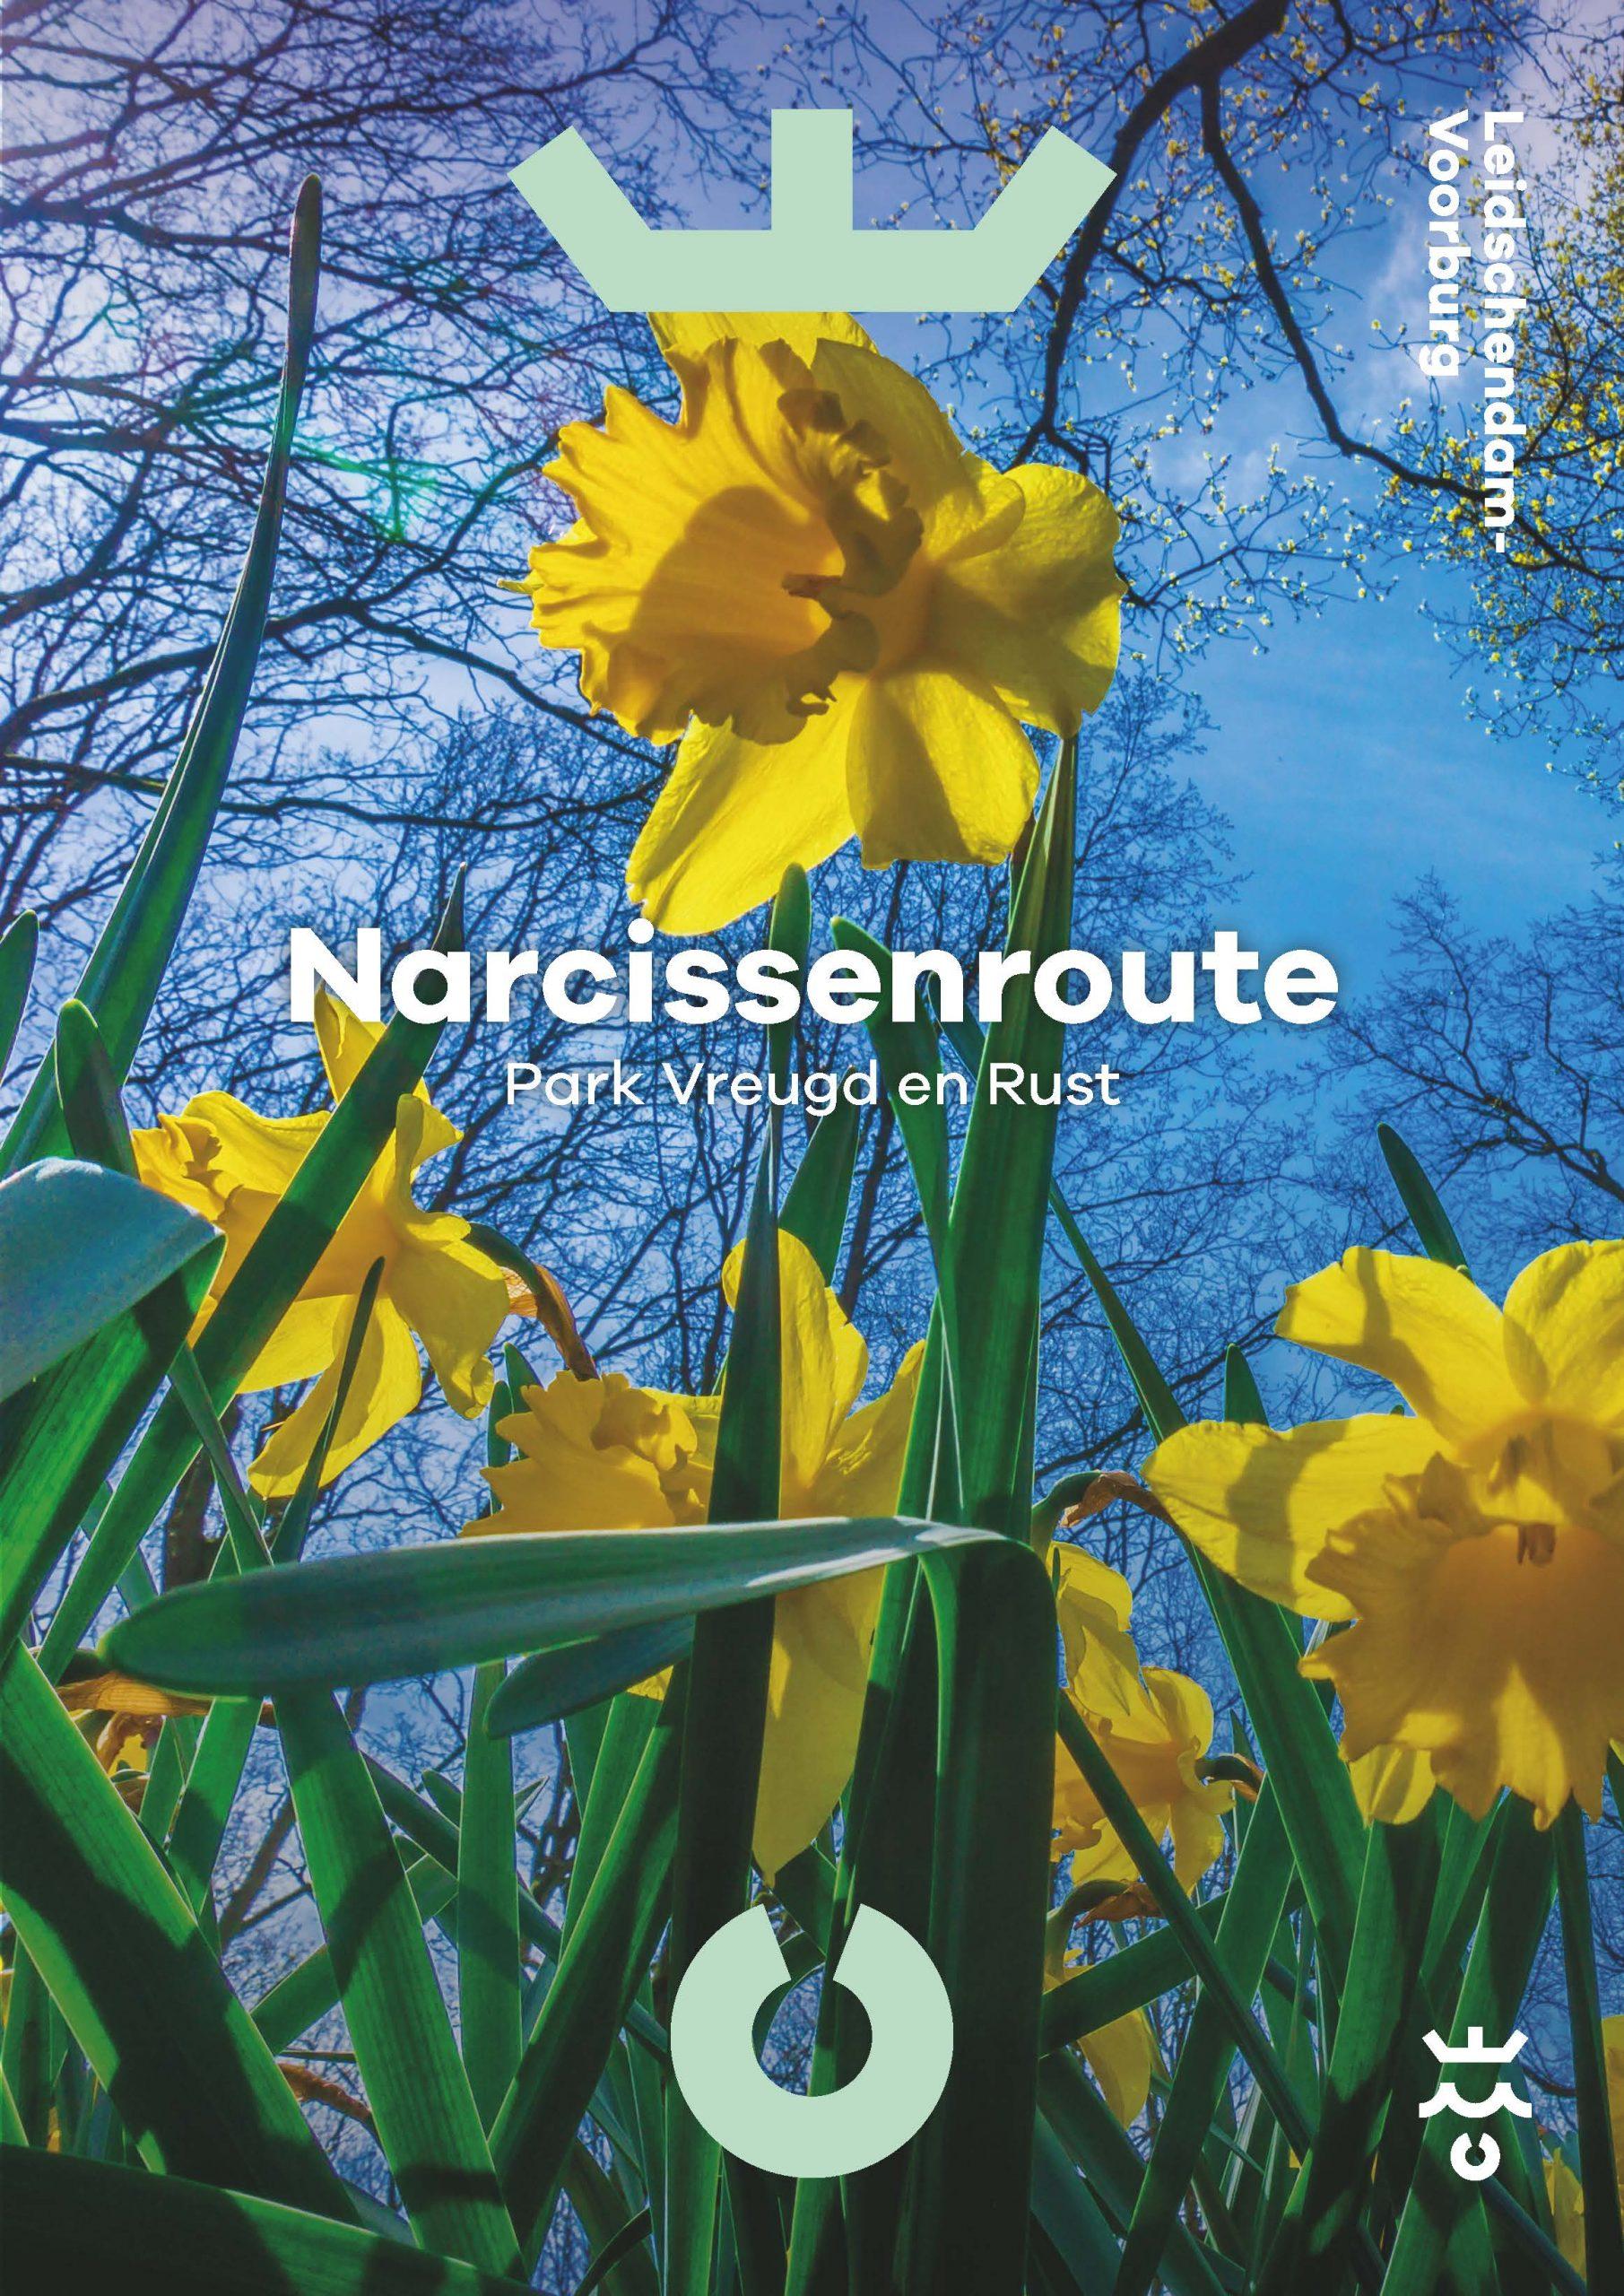 Narcissenroute weer beschikbaar